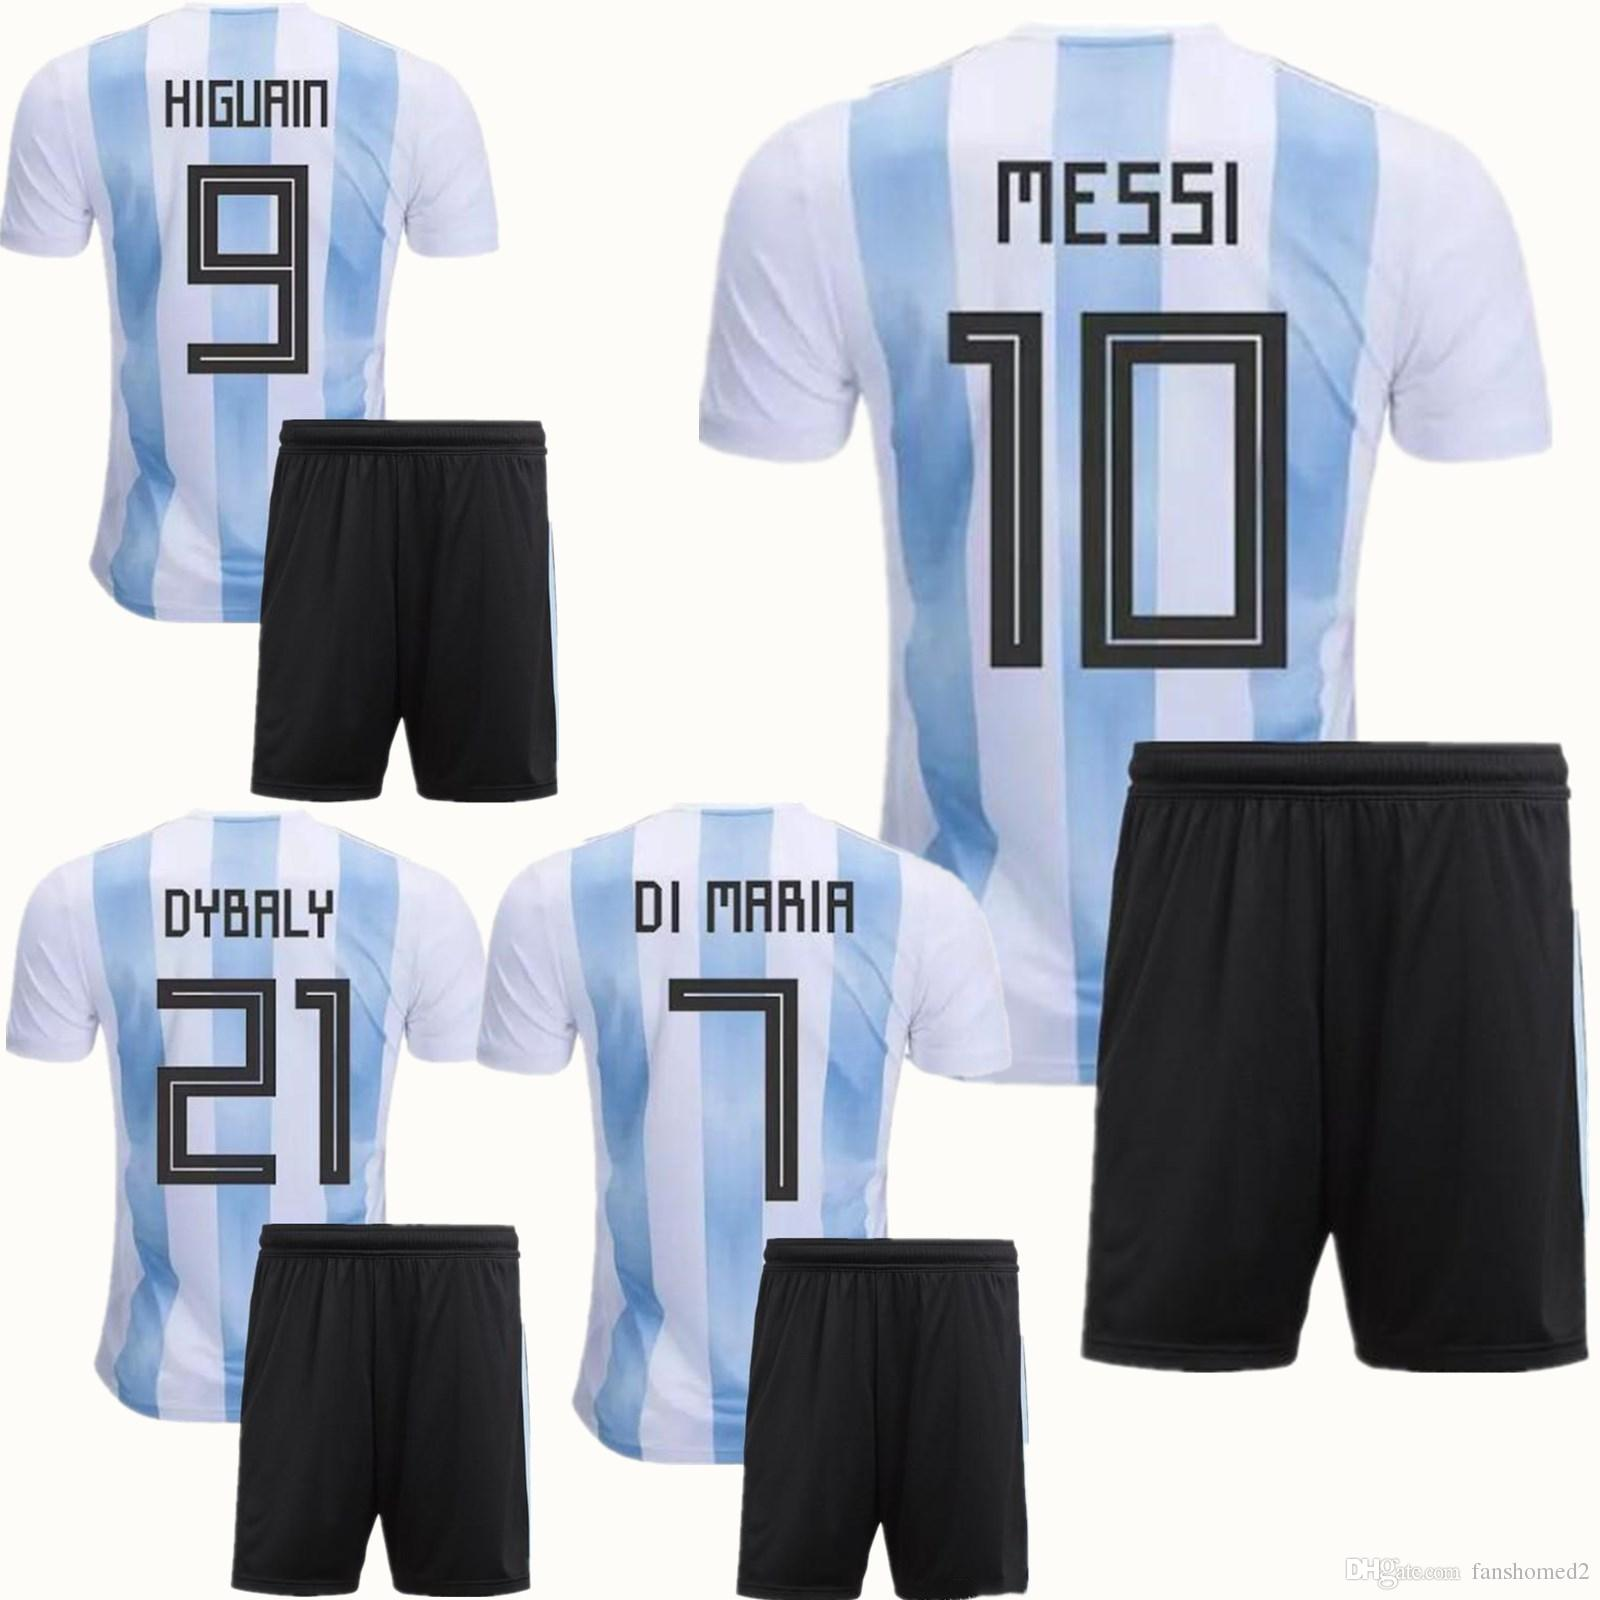 8e48d7d9e1 Compre 2018 Conjuntos De Futebol Da Copa Do Mundo Argentina 10 MESSI DI  MARIA AGUERO KOMPANY DYBALA Higuain Casa Kit Adultos Argentina Jersey  Uniforme ...